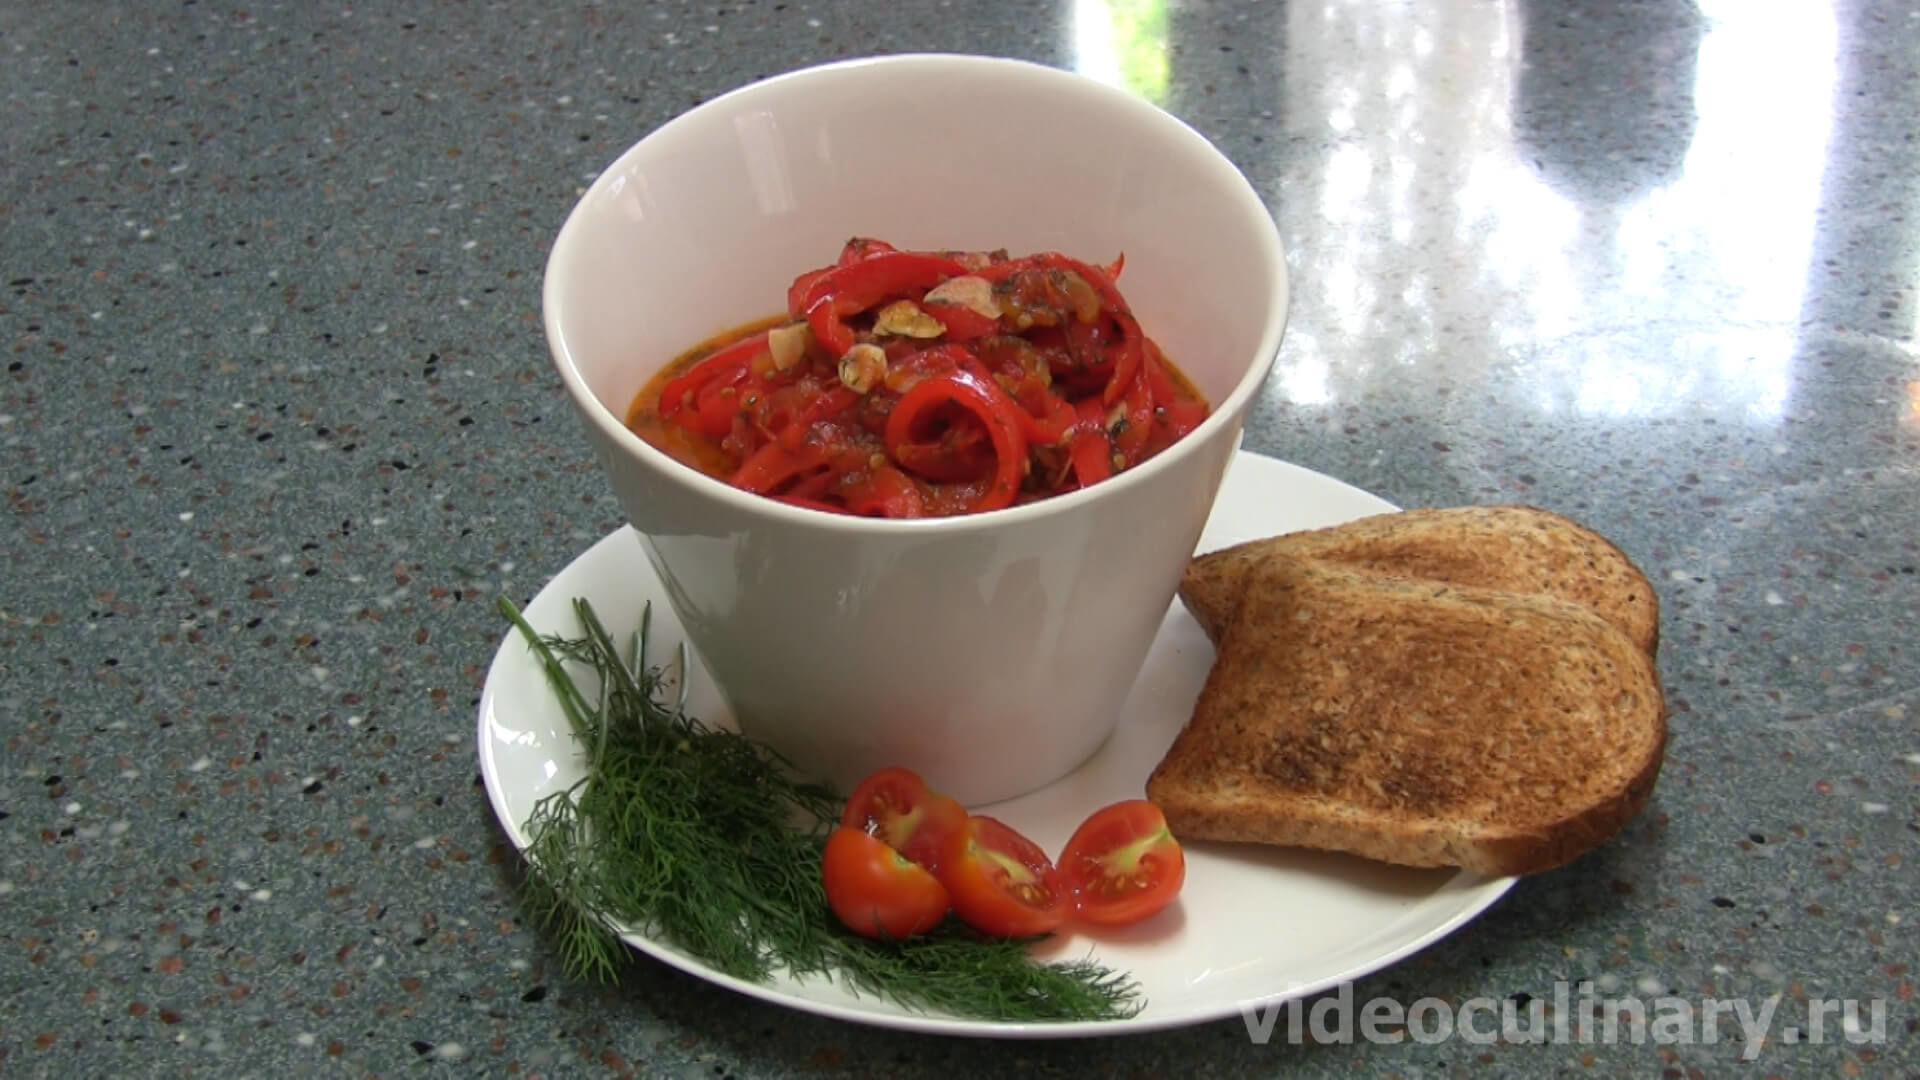 Рецепт праздничного блюда из кабачков